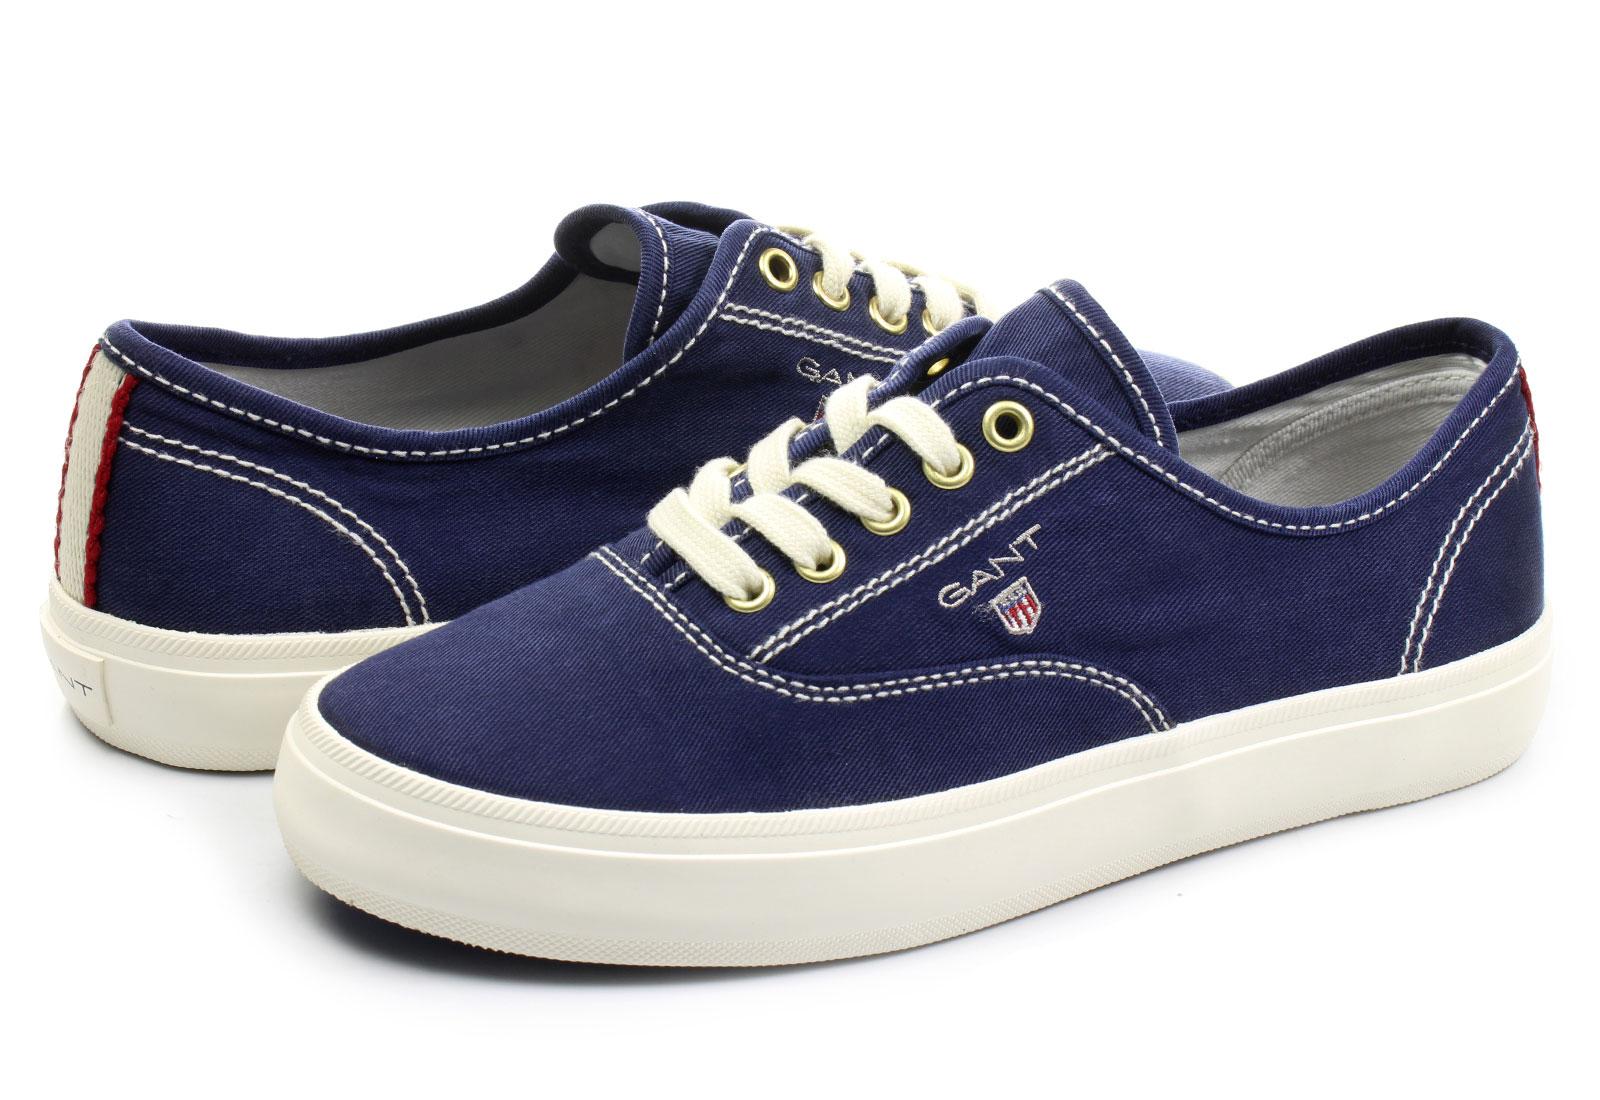 Gant Sneakers Zoe 12538161 G62 Online Shop For